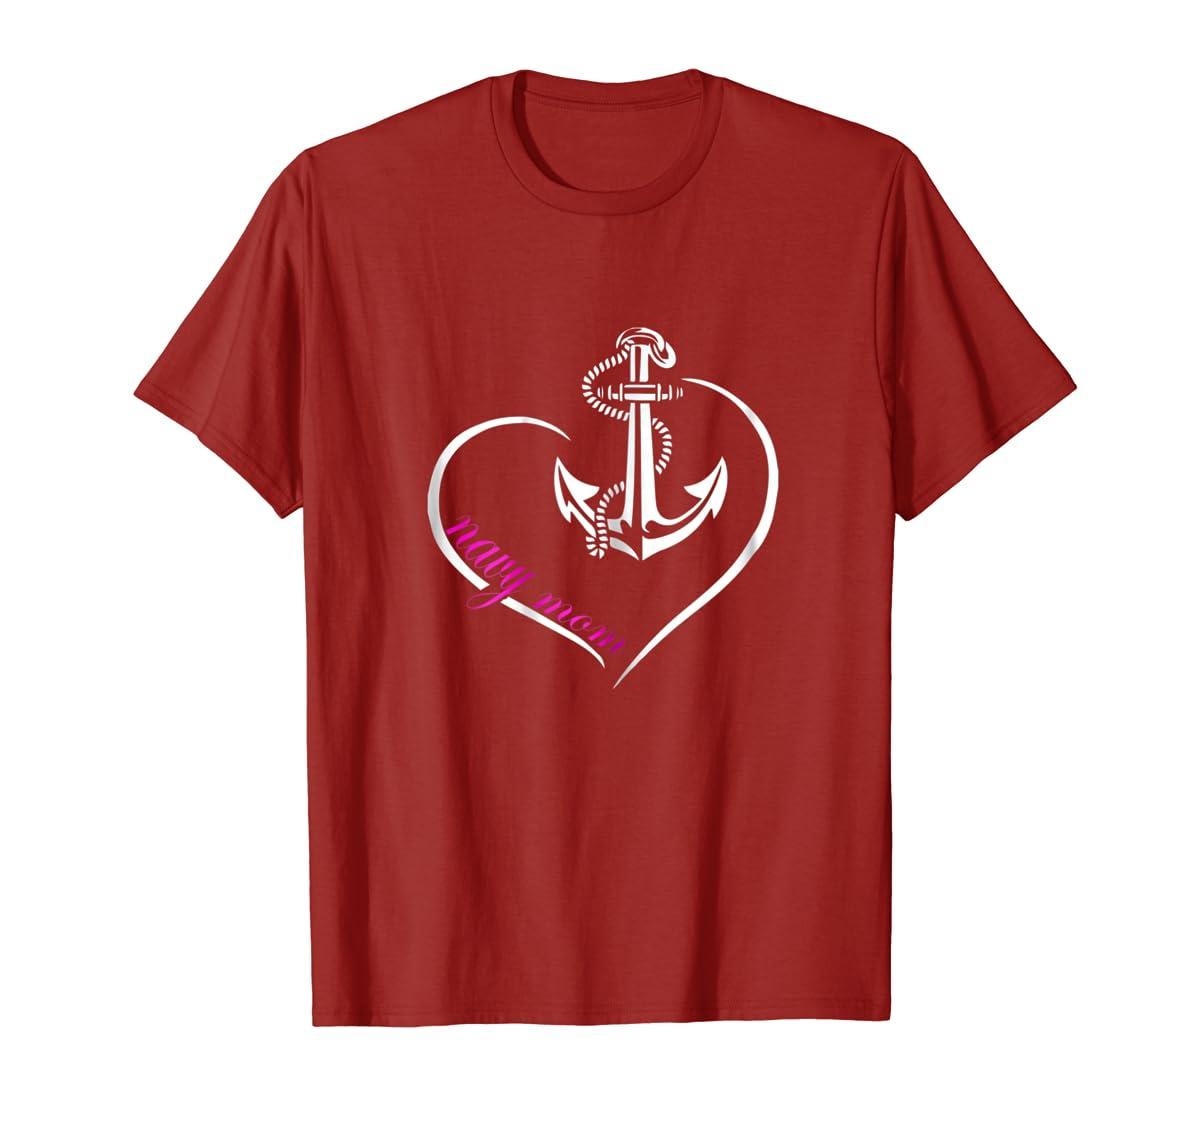 Womens U.S. NAVY SHIRT ORIGINAL PROUD NAVY MOM T-TSHIRT-Men's T-Shirt-Red